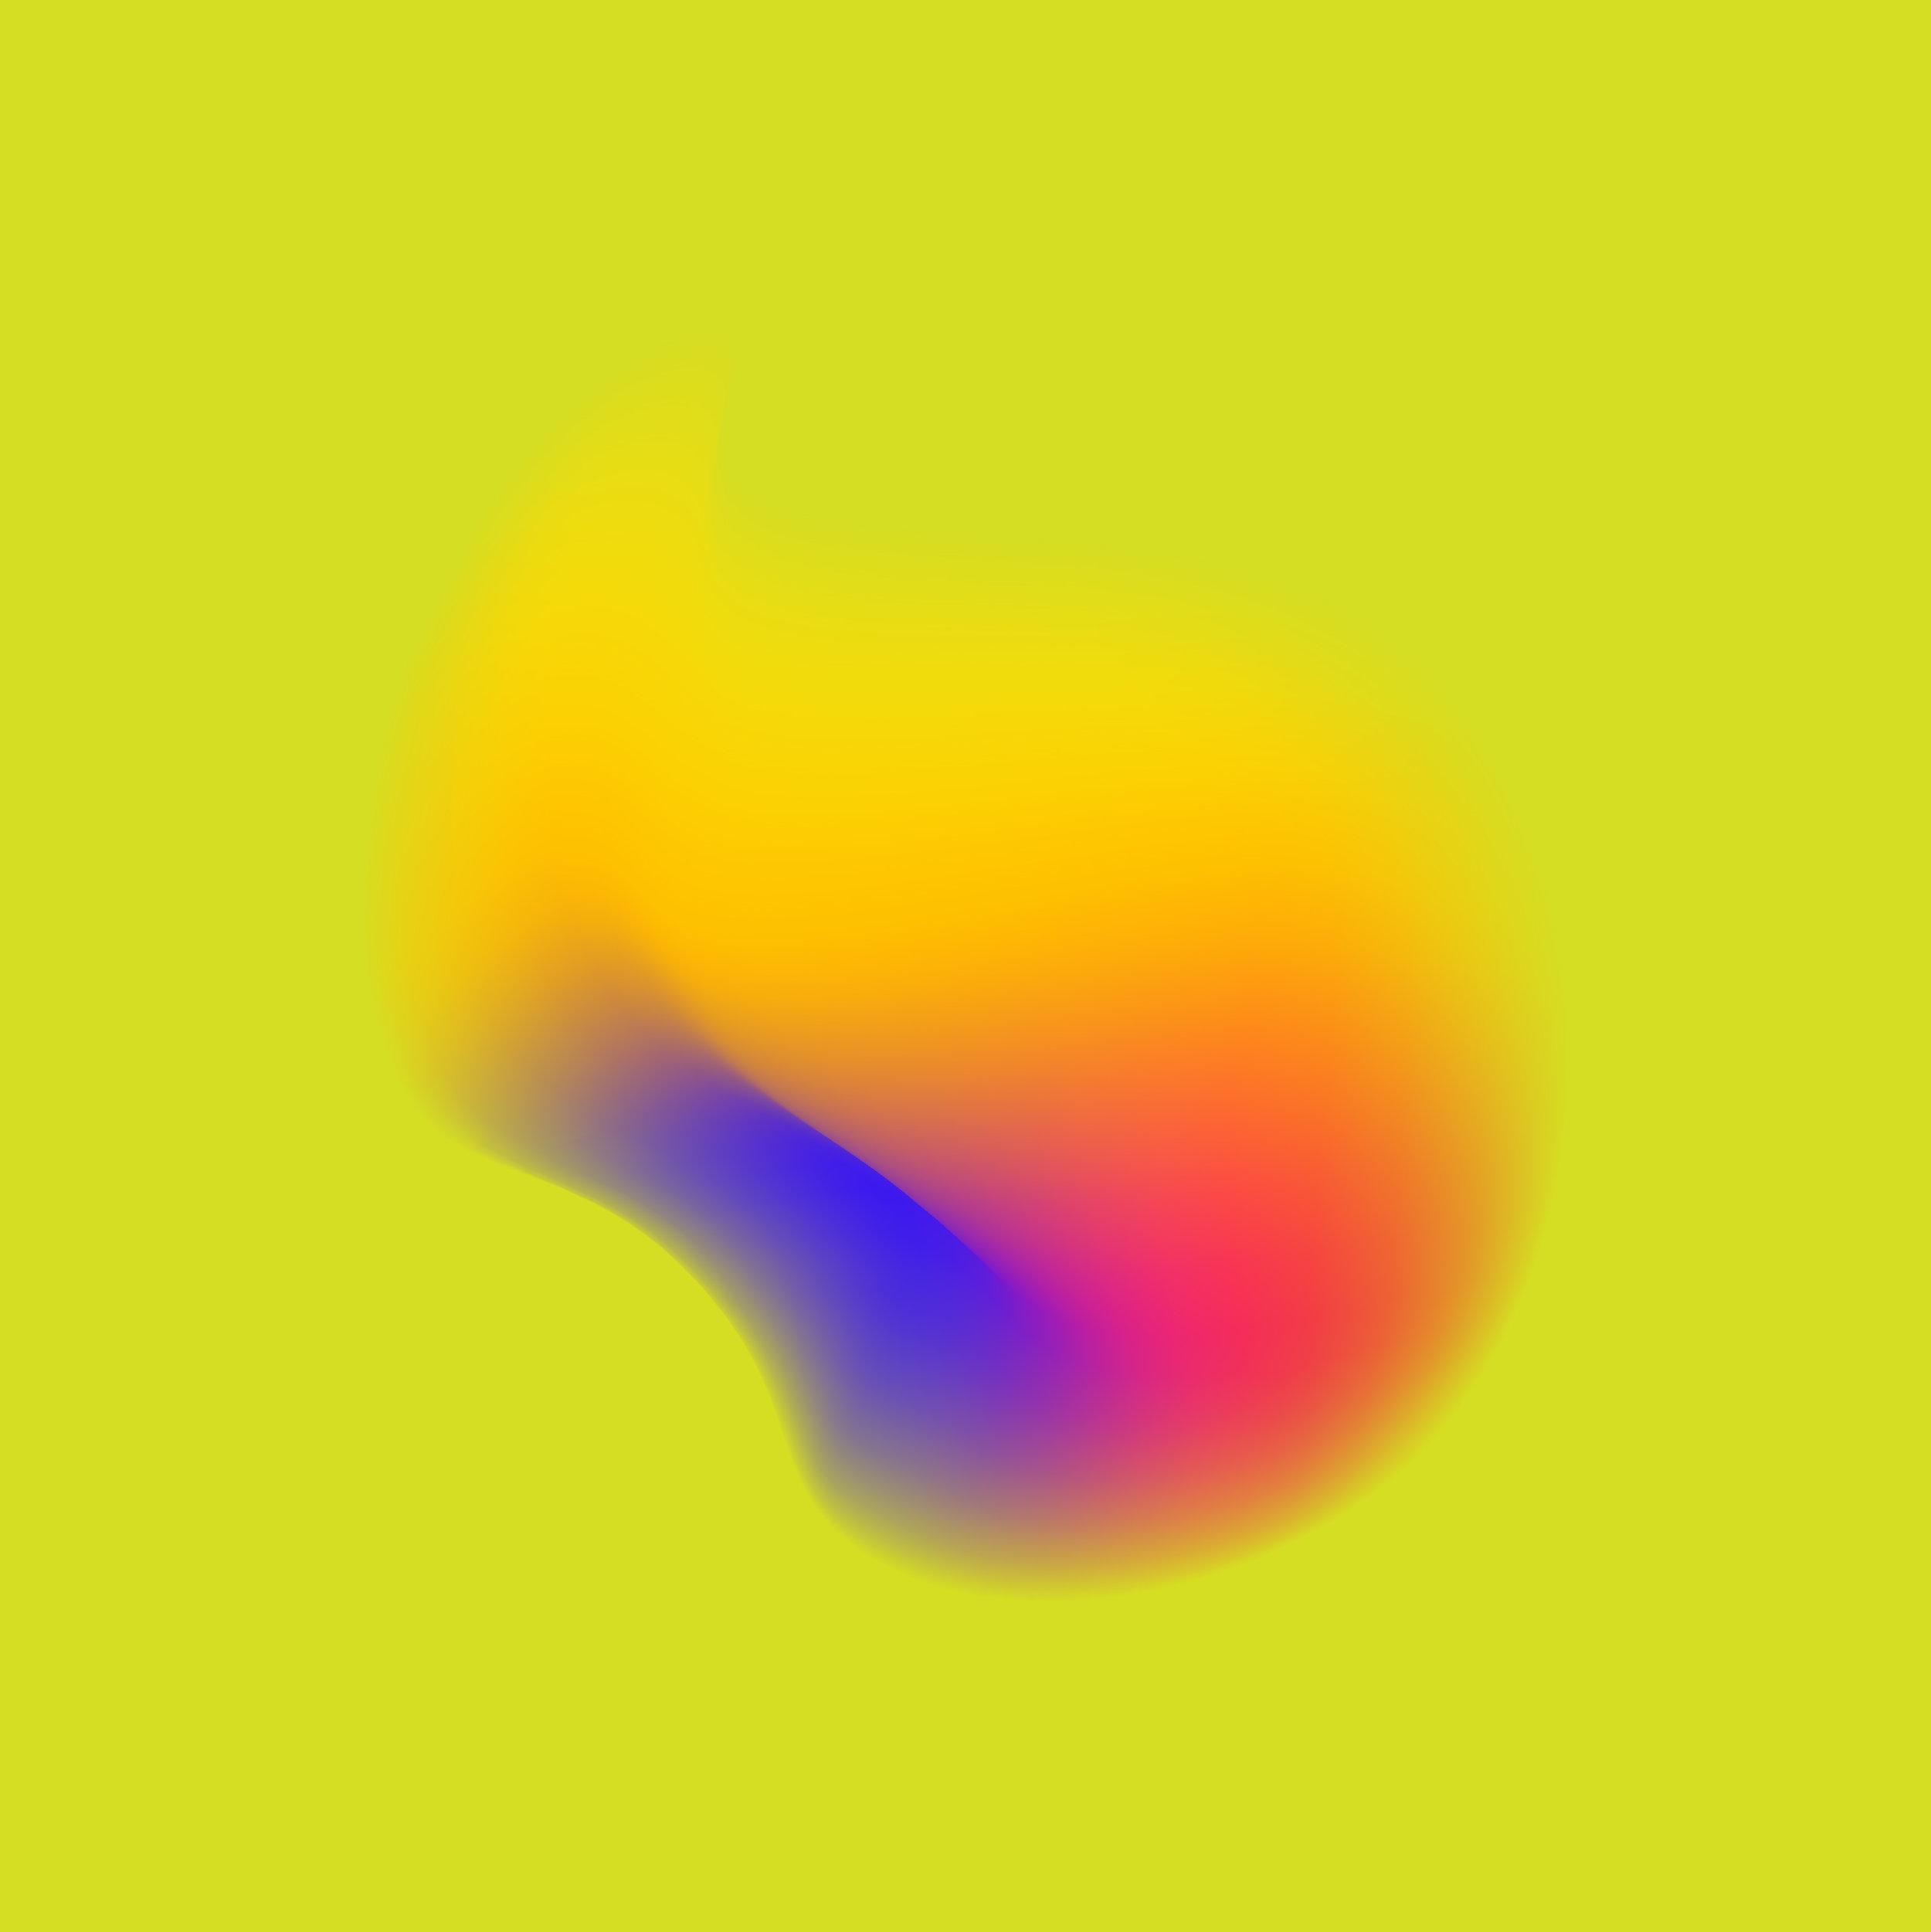 gradient blob freeform-03.jpg